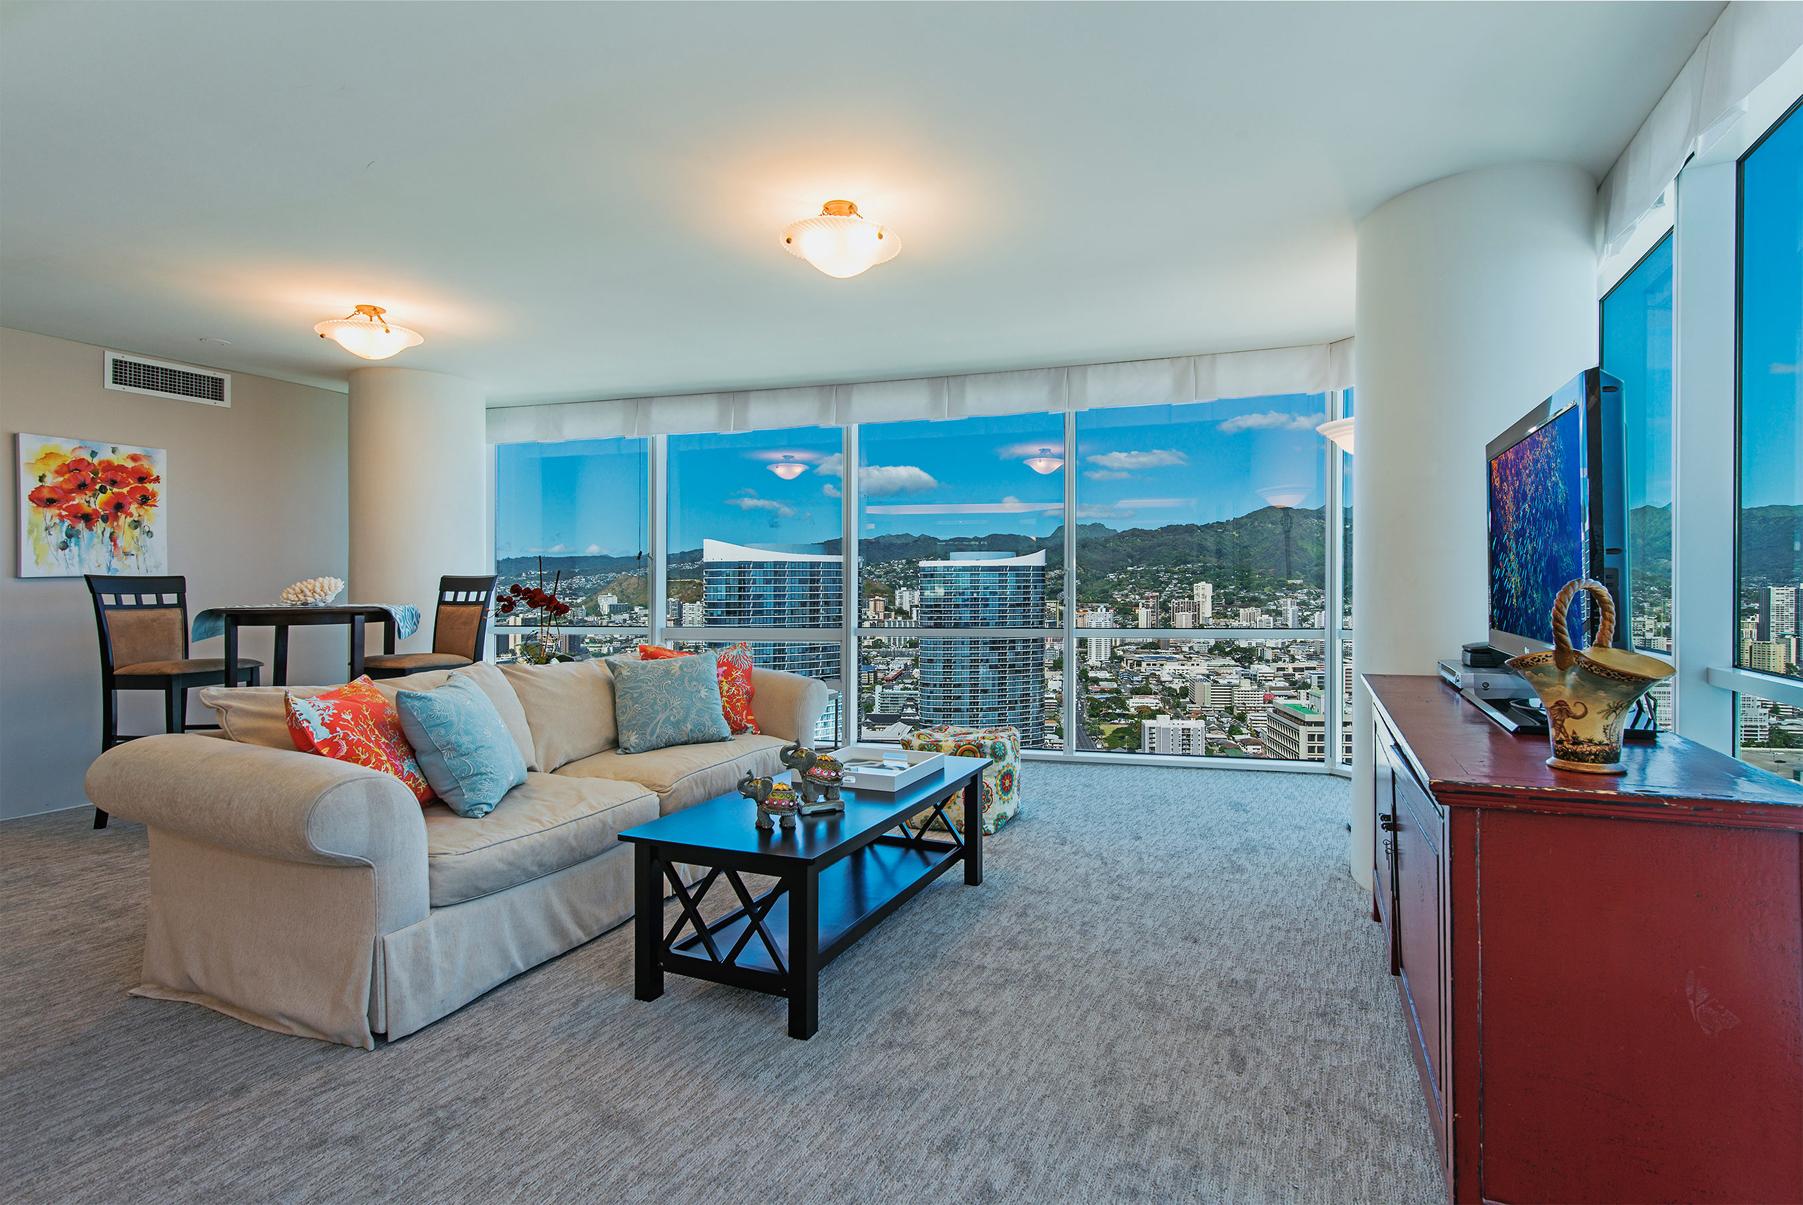 Casa Unifamiliar por un Venta en Luxury in the Sky 88 Piikoi Street #4303 Kakaako, Honolulu, Hawaii, 96813 Estados Unidos